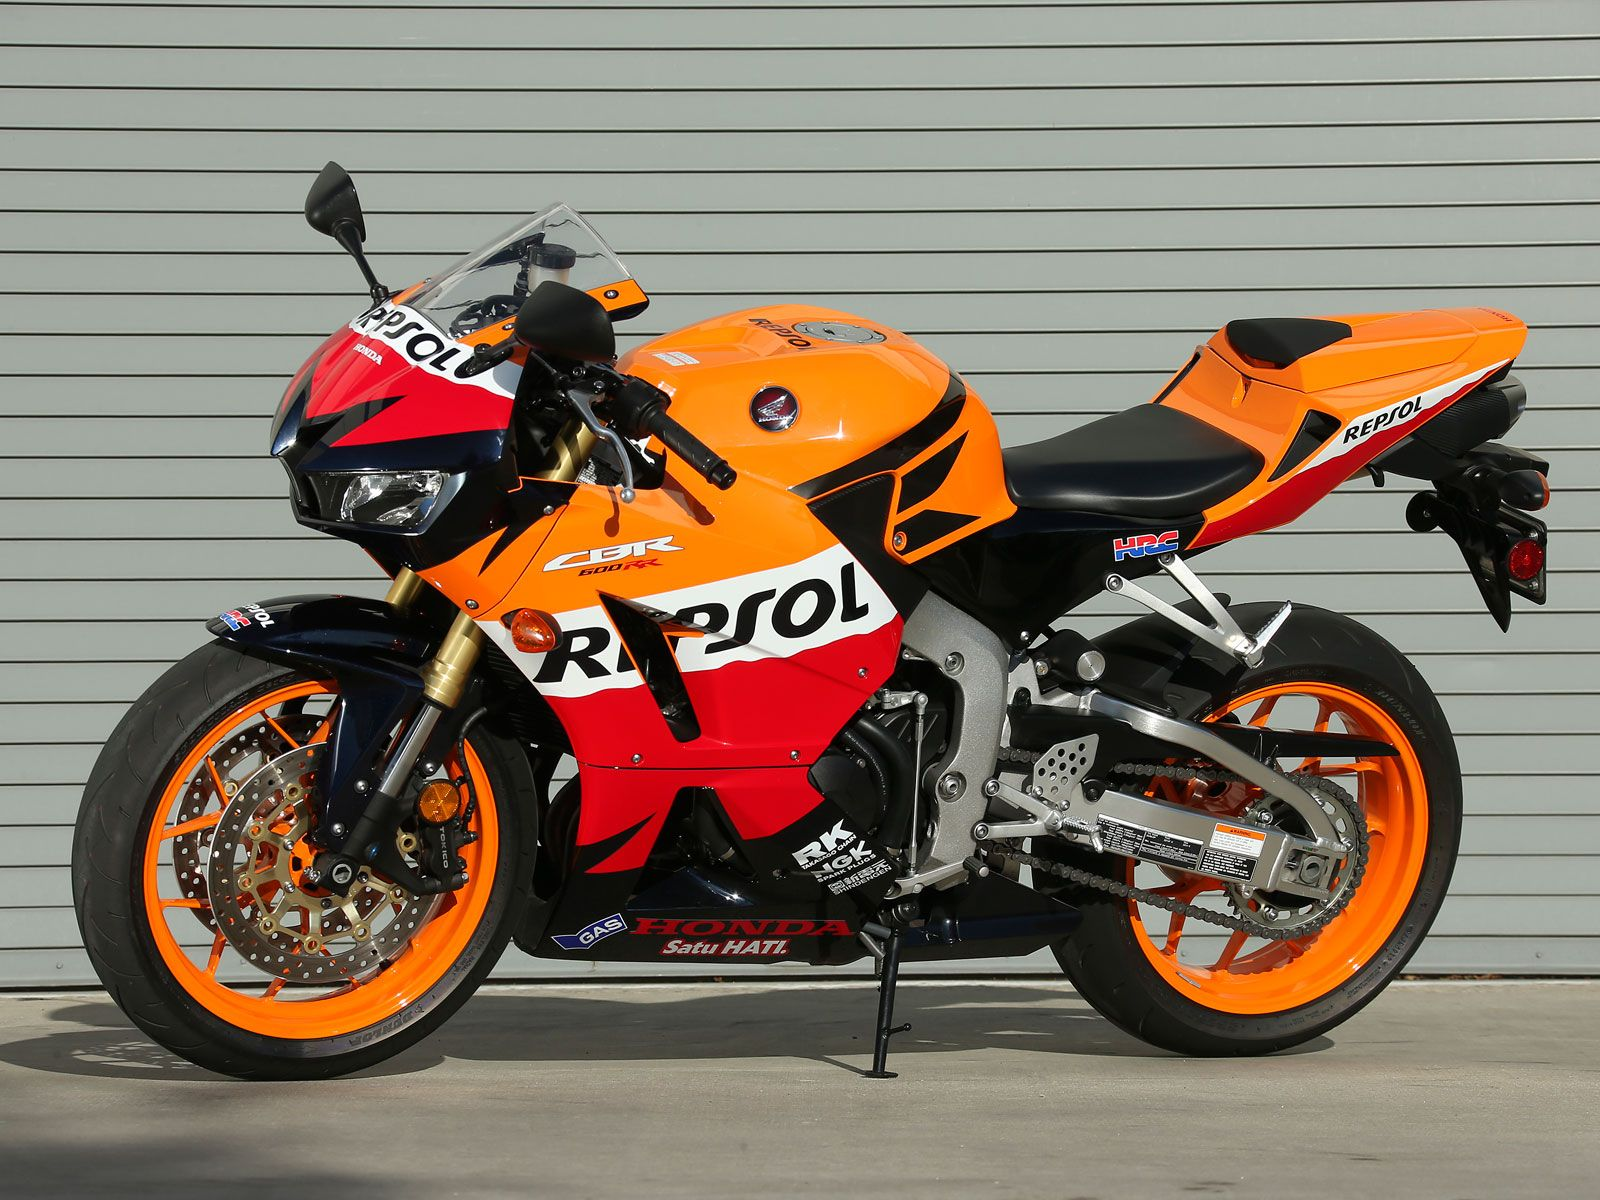 2011 honda cbr 600rr all new reviews - Honda Repsol Cbr 600 Rr T R I N I T Y Pinterest Cbr Honda And Cbr 600